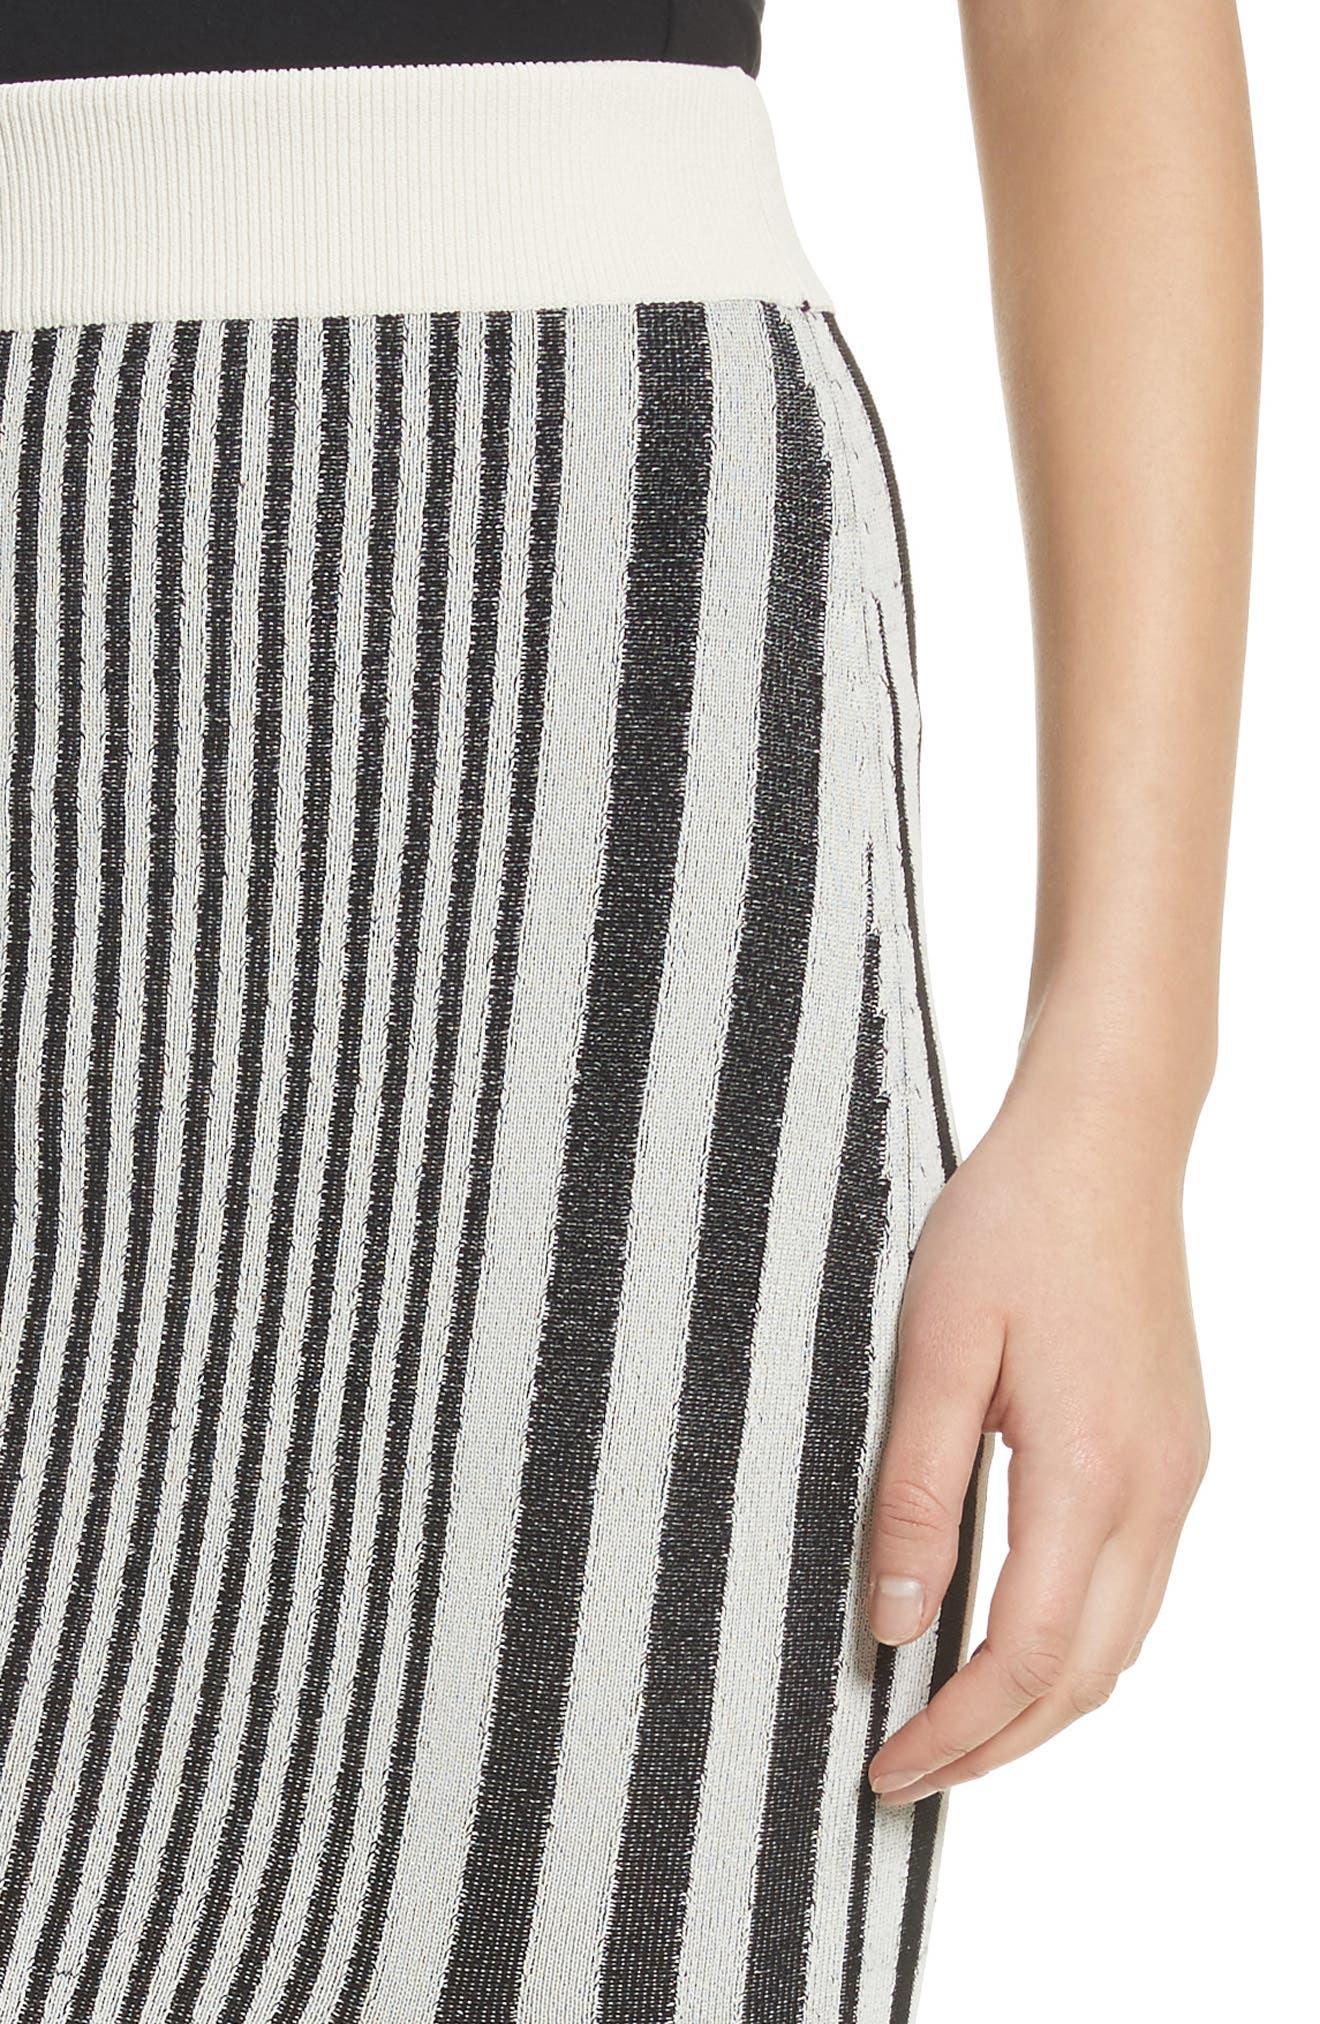 Tassel Trim Stripe Pencil Skirt,                             Alternate thumbnail 5, color,                             Black